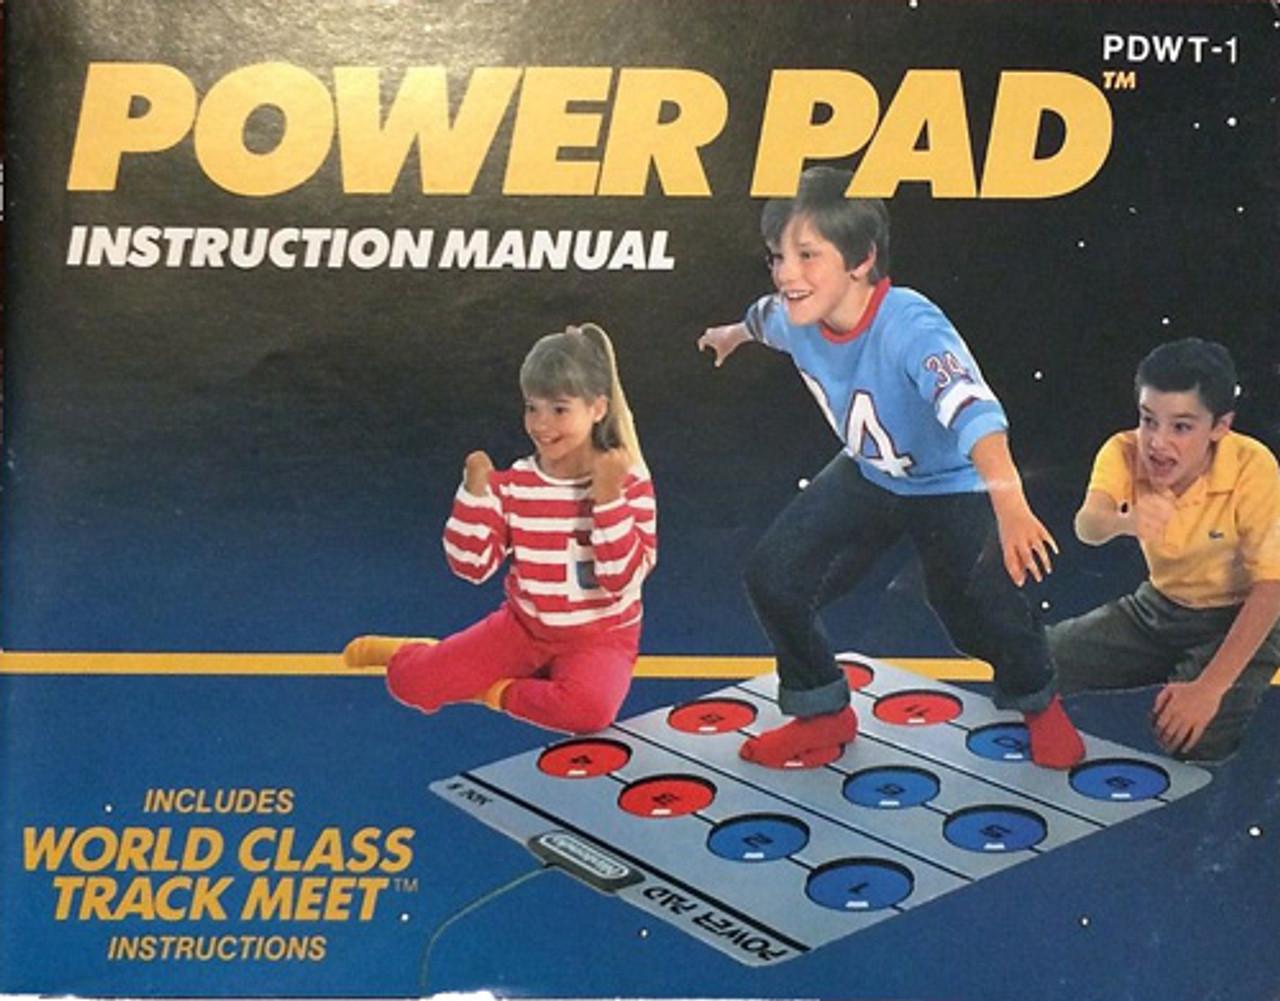 nintendo power pad instructions